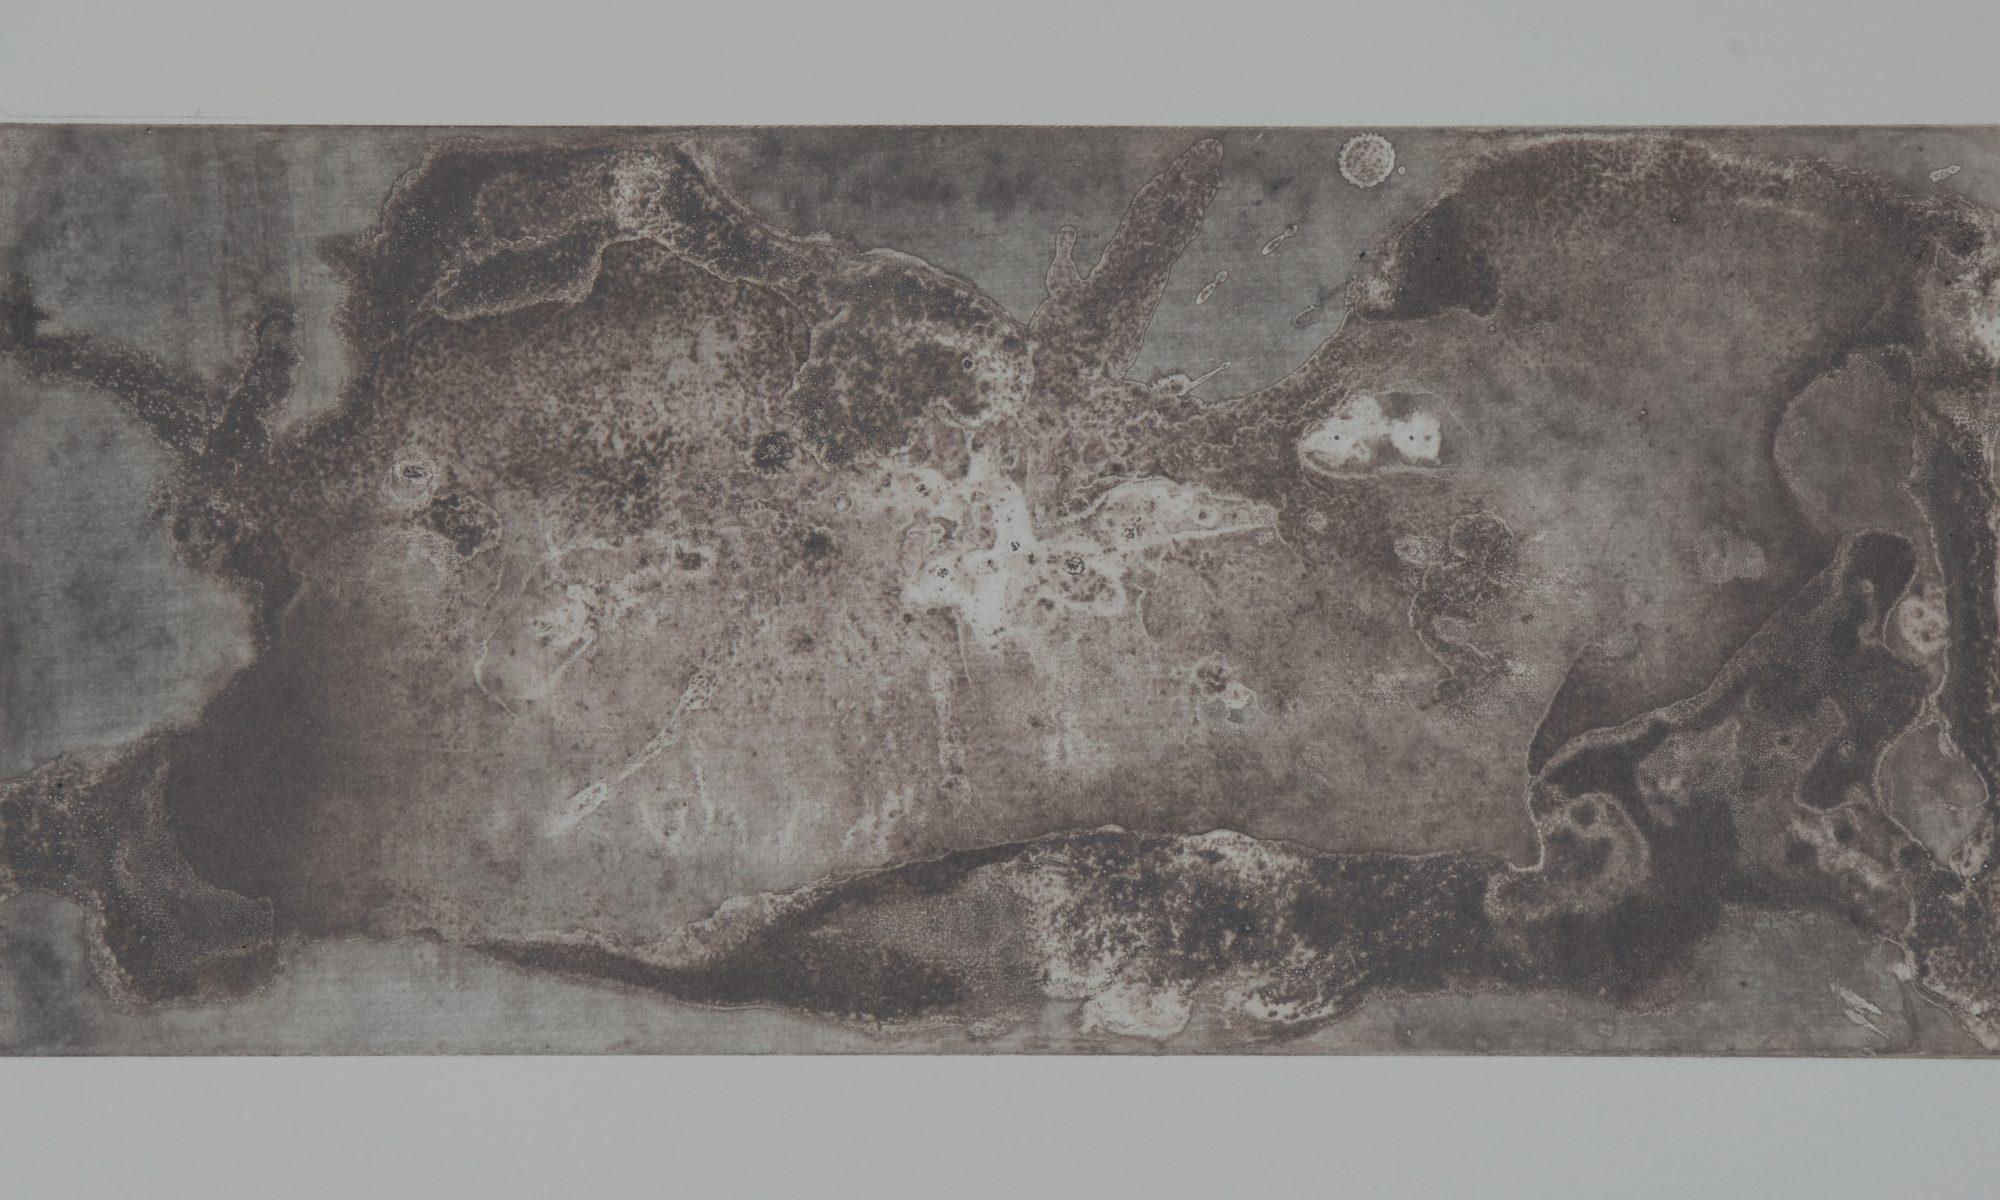 Rhizome One Point Two, Soft Ground Etching on Zinc, 2017, Jane Elizabeth Bennett